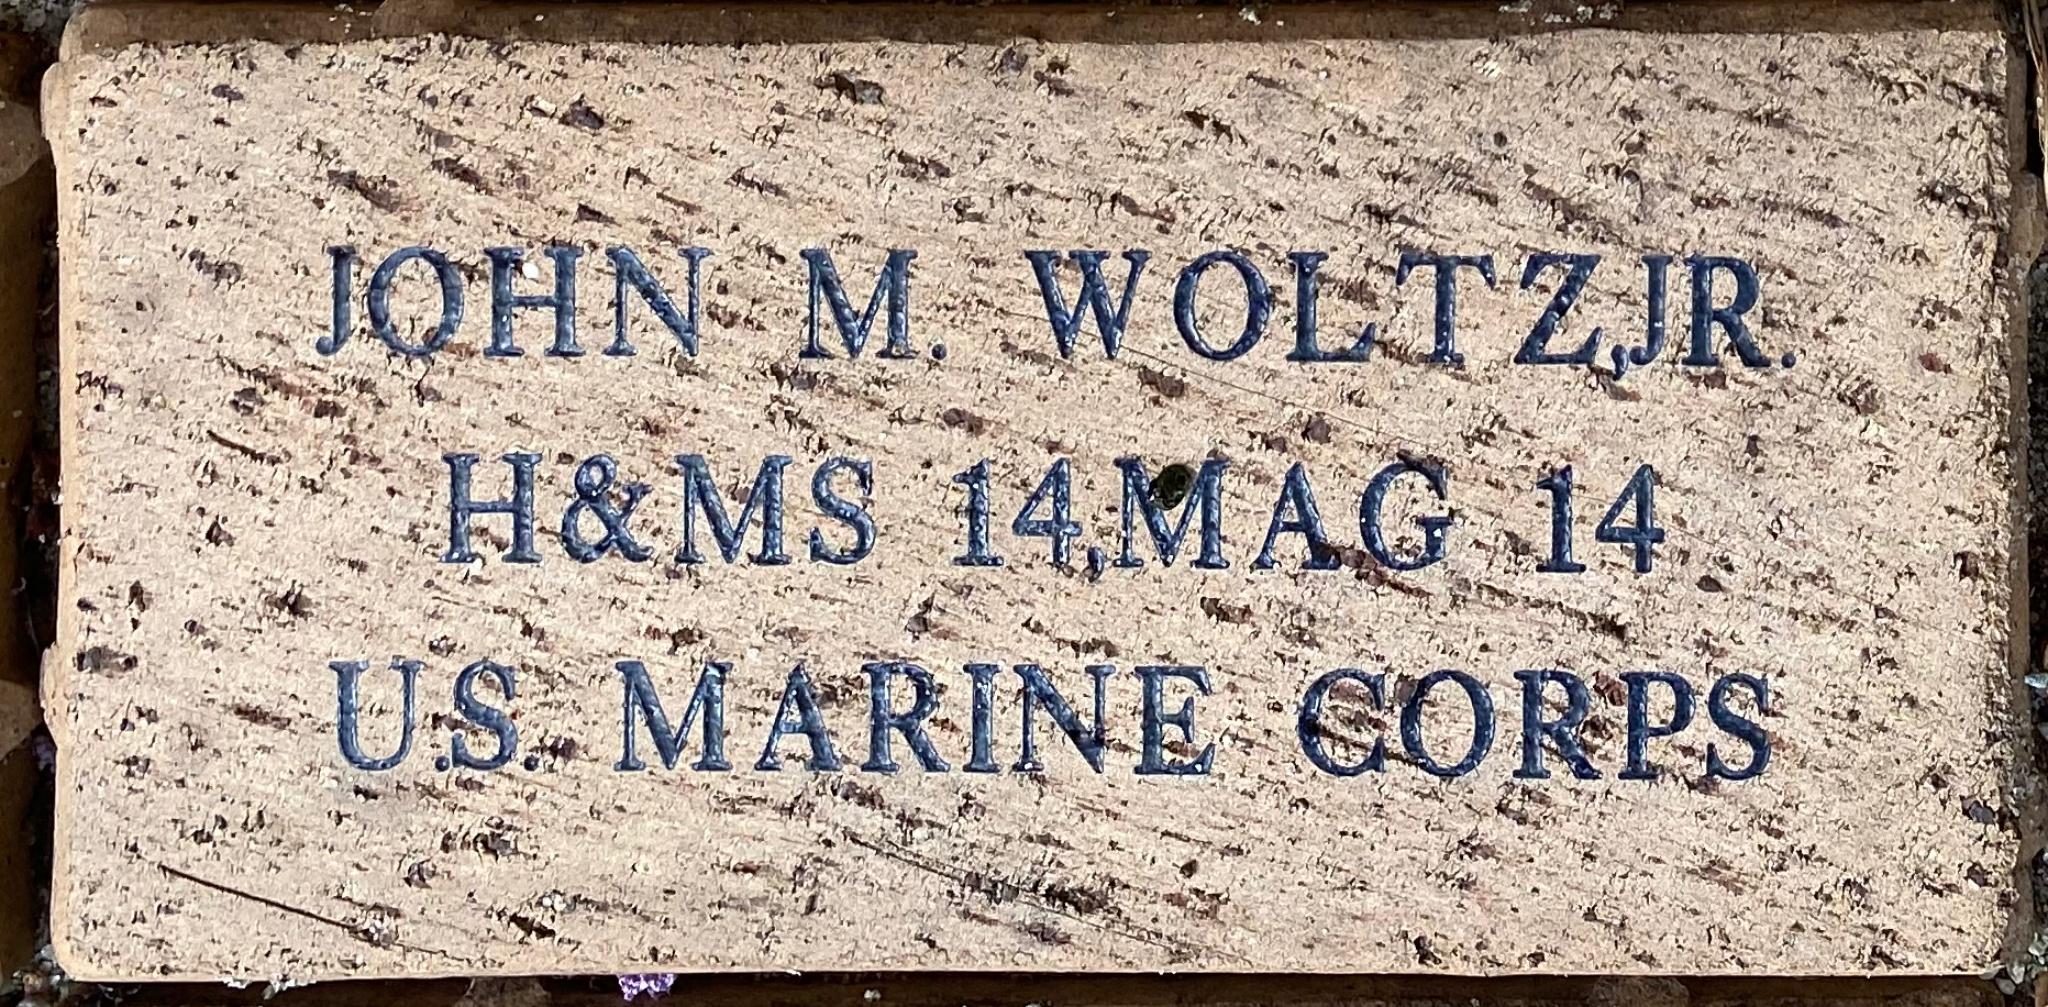 JOHN M. WOLTZ,JR. H&MS 14, MAG 14 U.S. MARINE CORPS